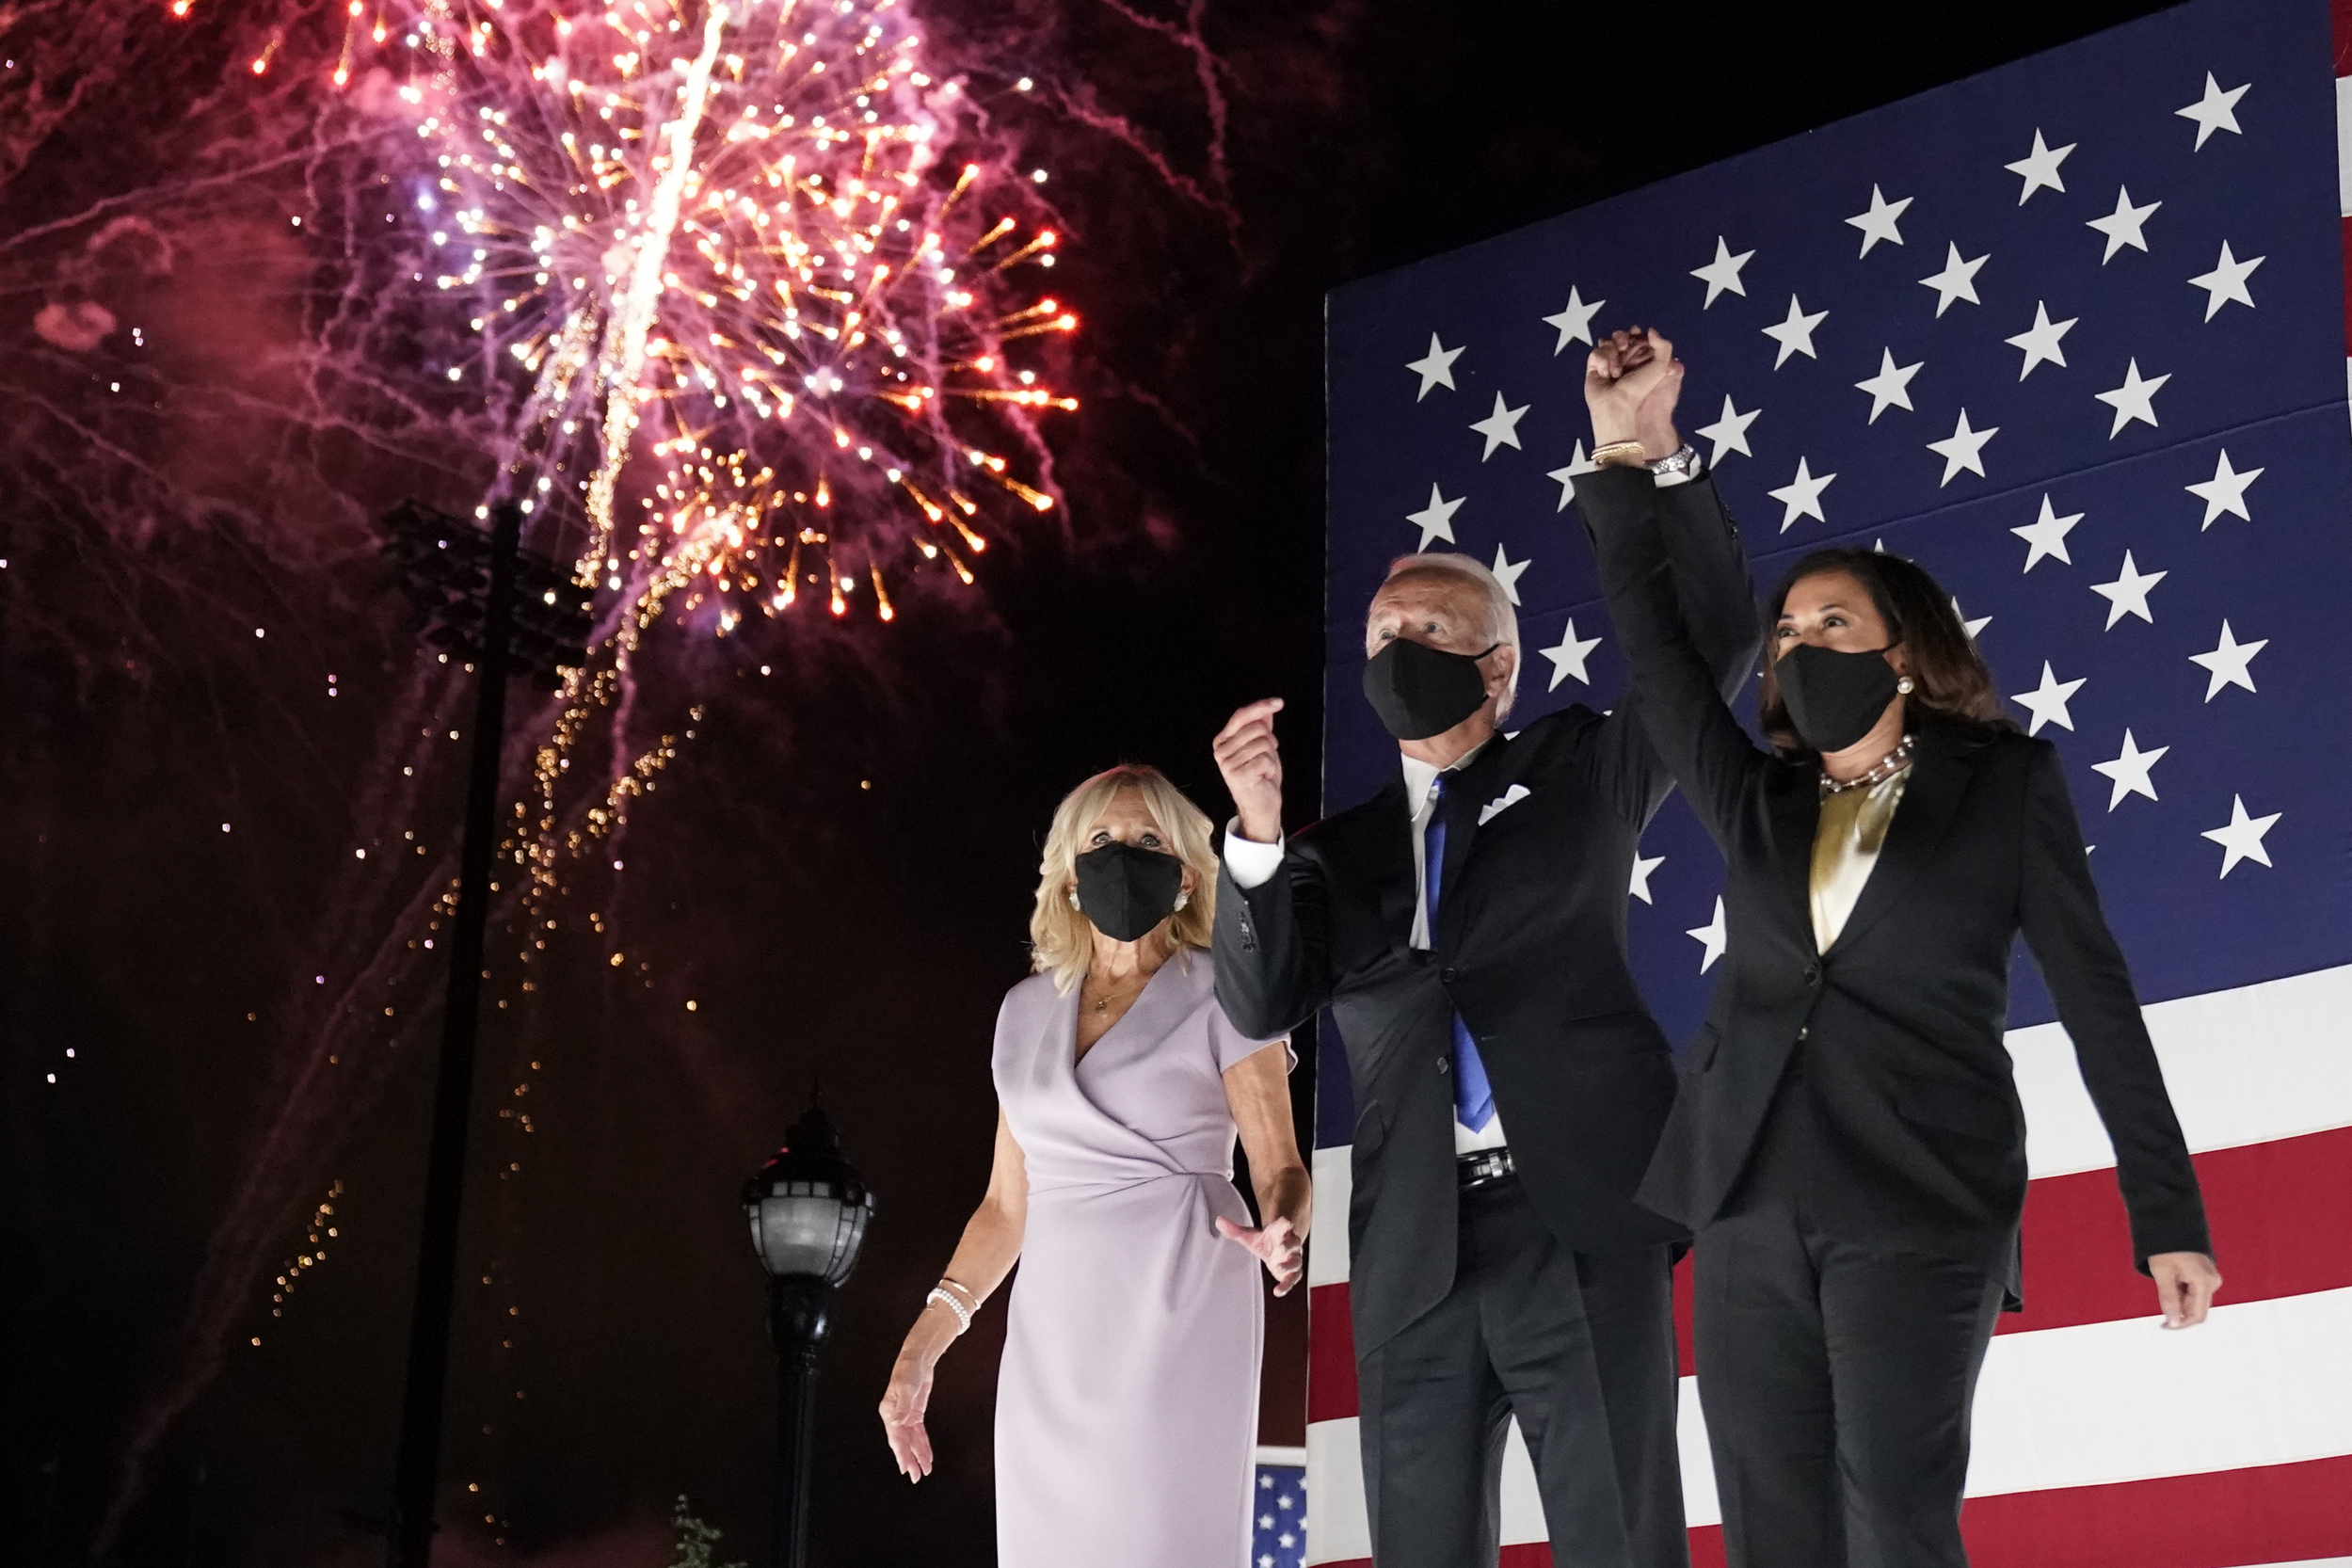 Joe Biden Vows To End Us Season Of Darkness On Final Night Of Dnc